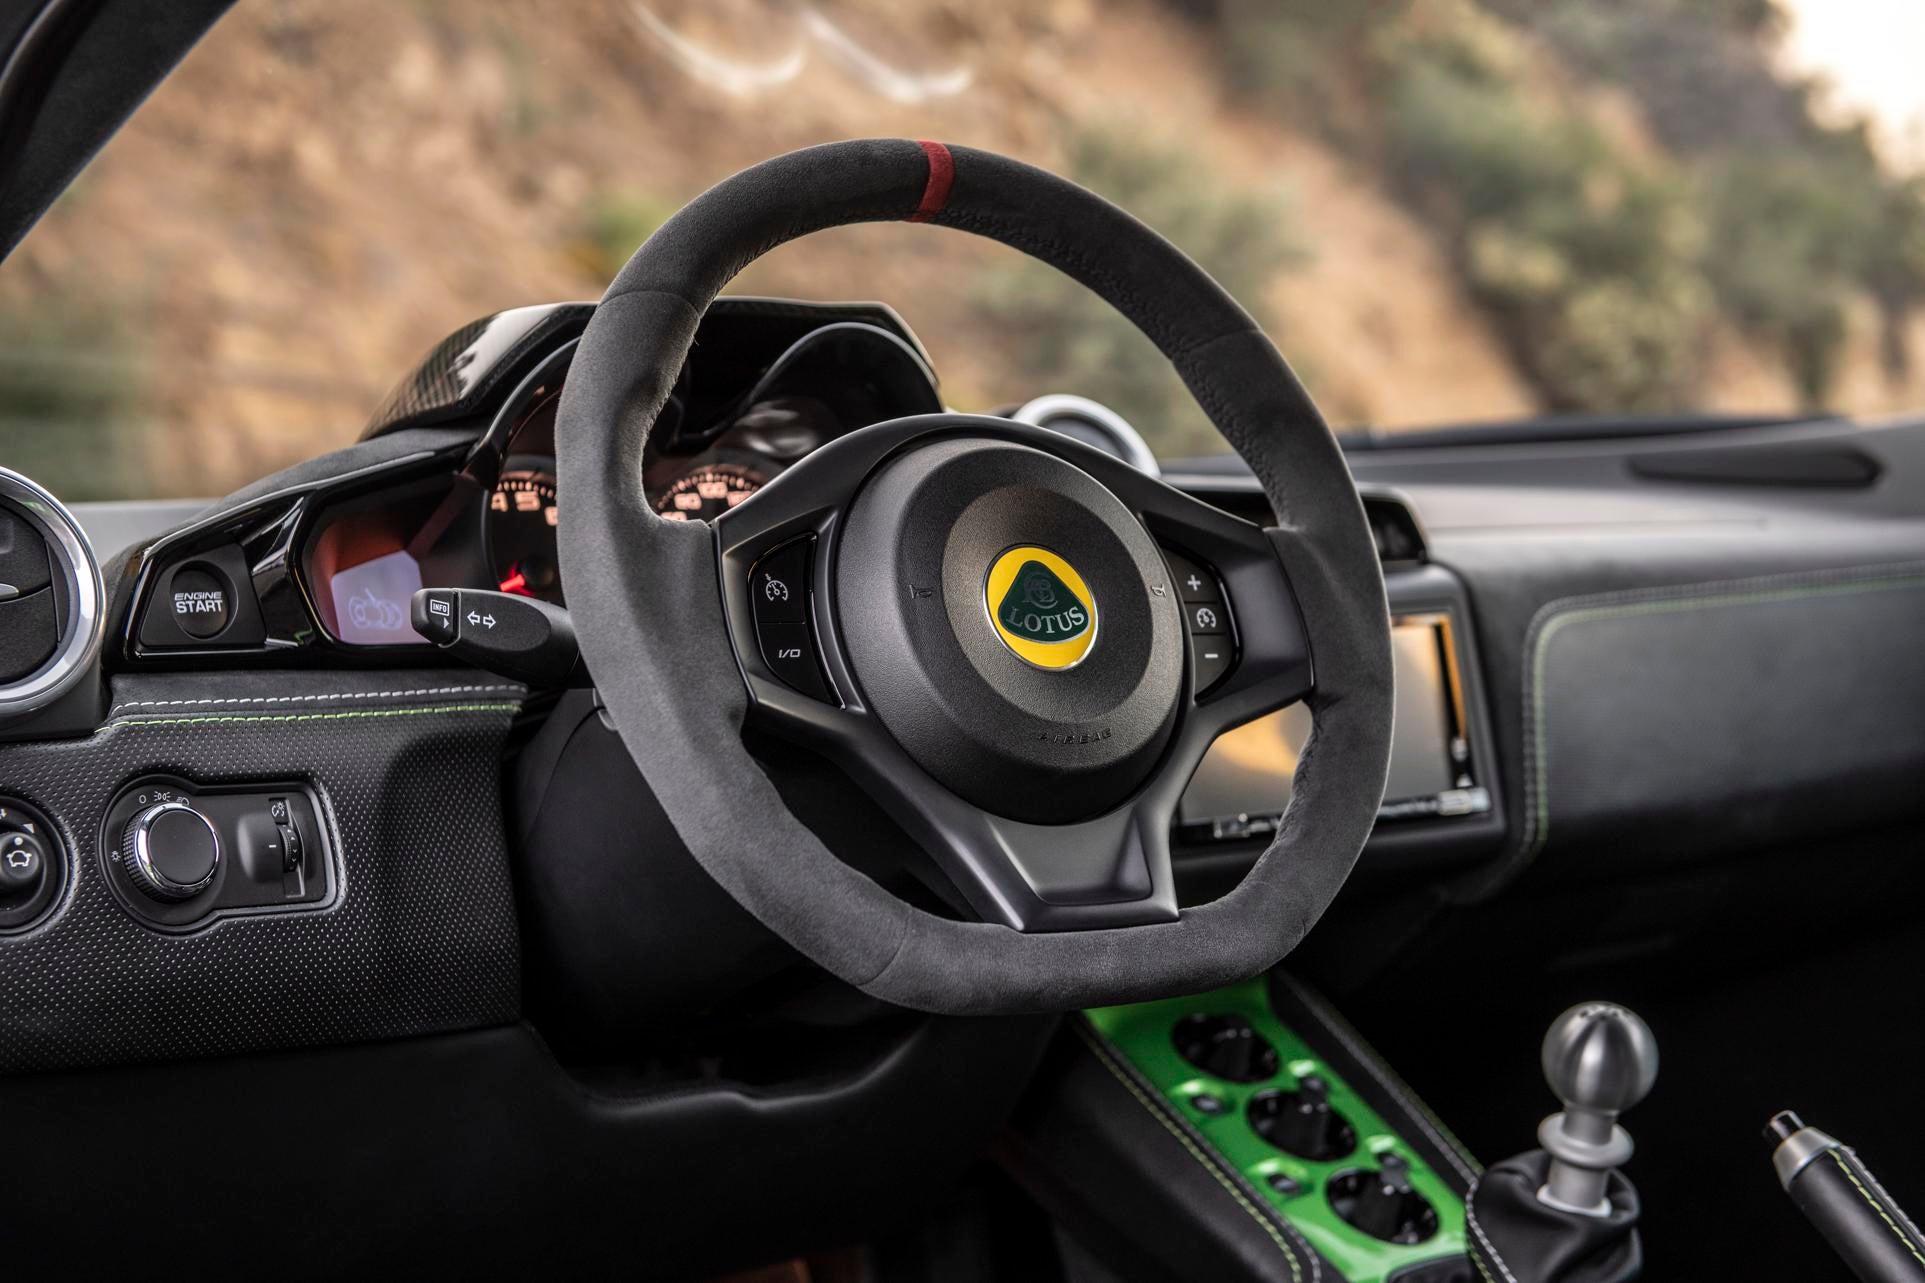 2020 Lotus Evora Gt Review The Anti Modern Sports Car The Drive